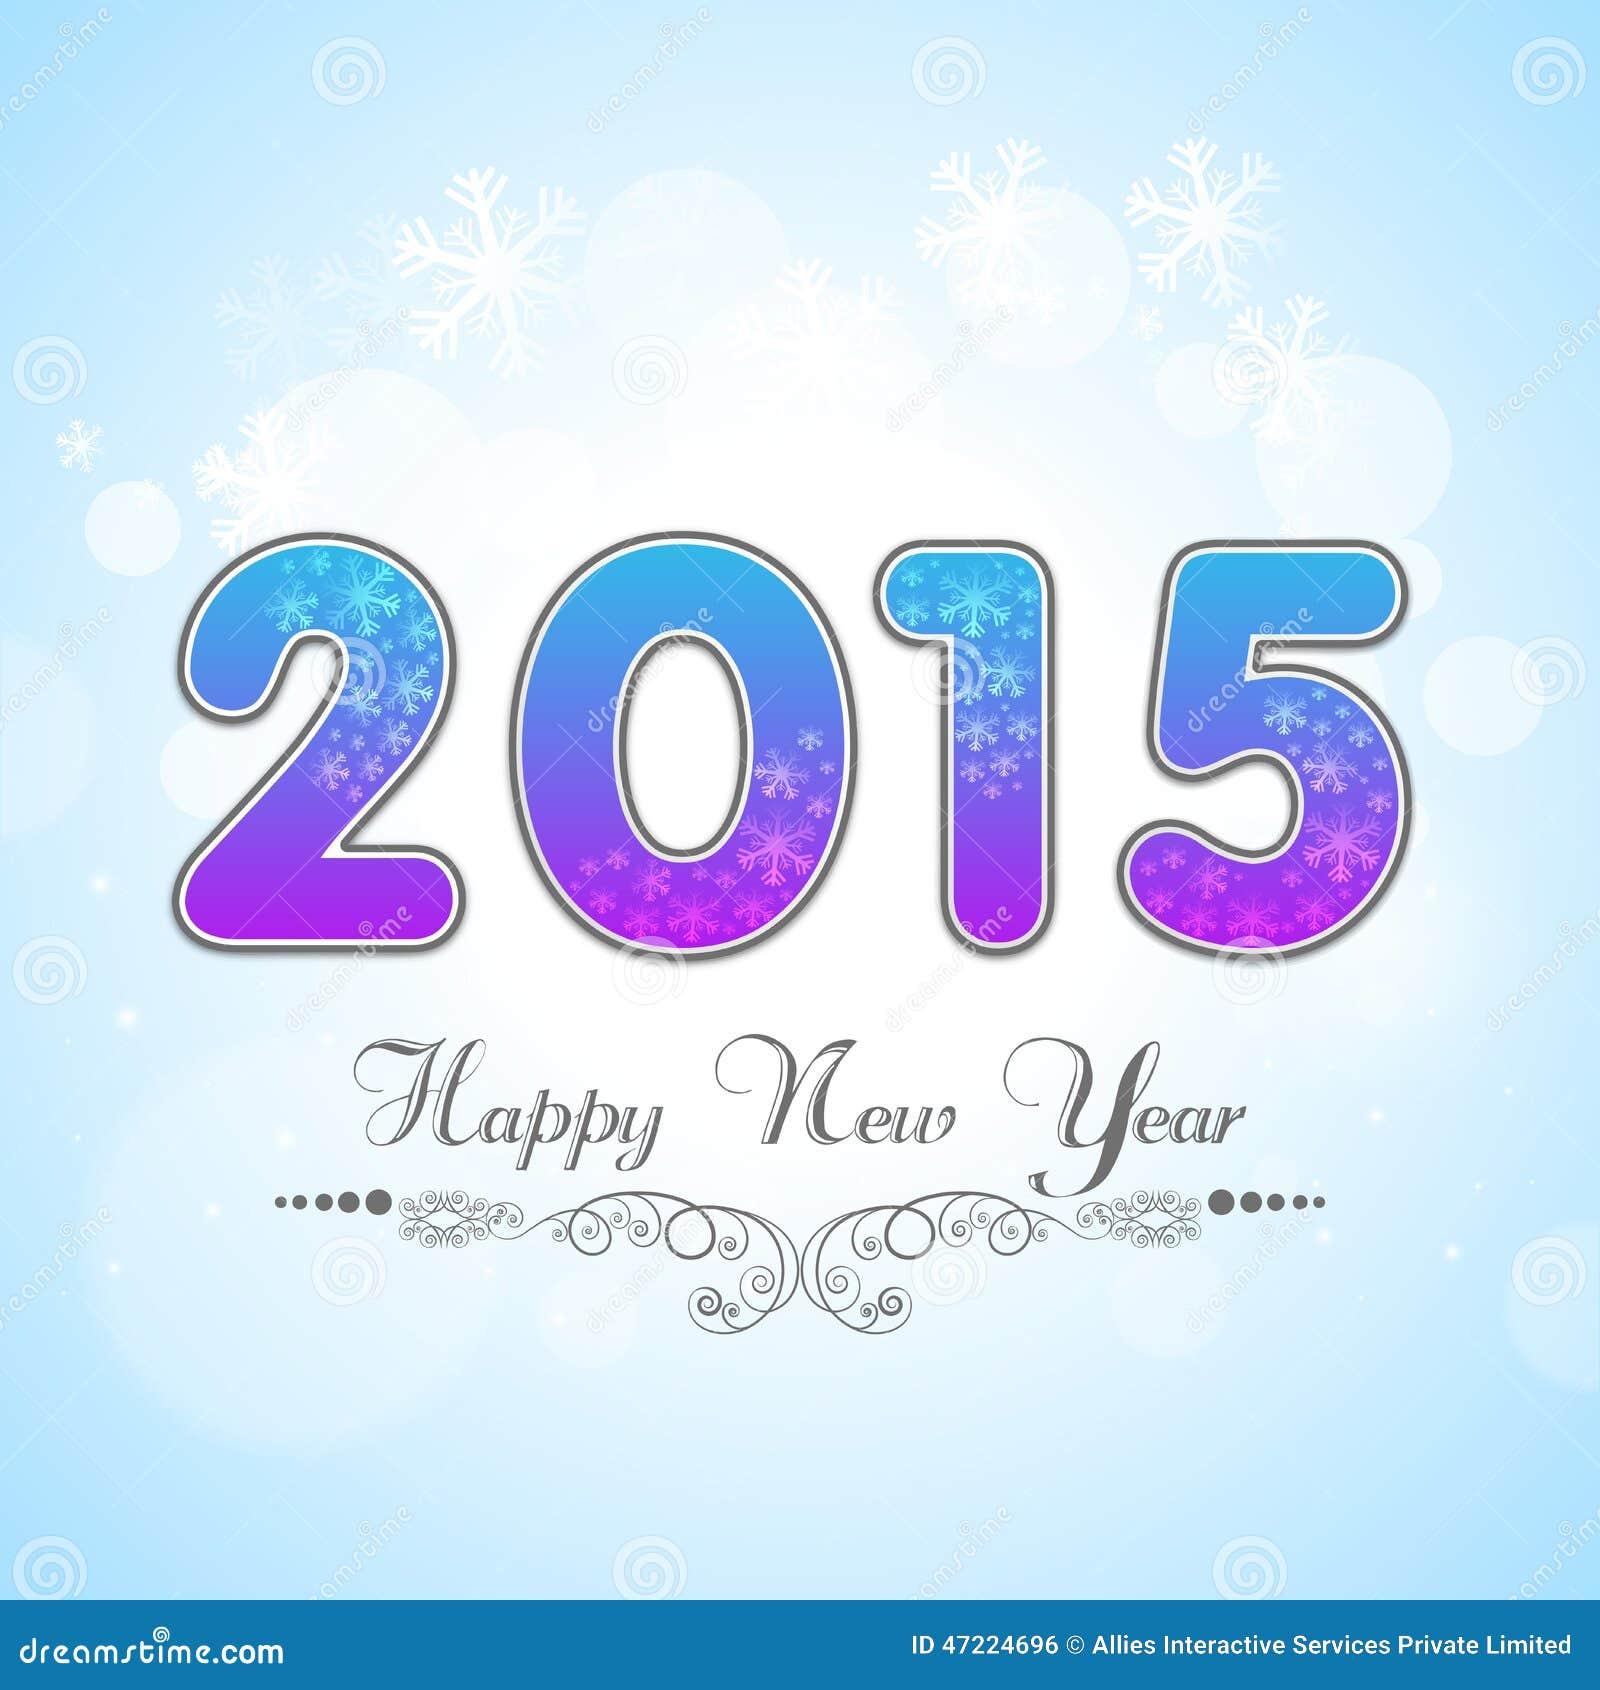 Stylish Greeting Card For New Year 2015 Celebration With Creativ